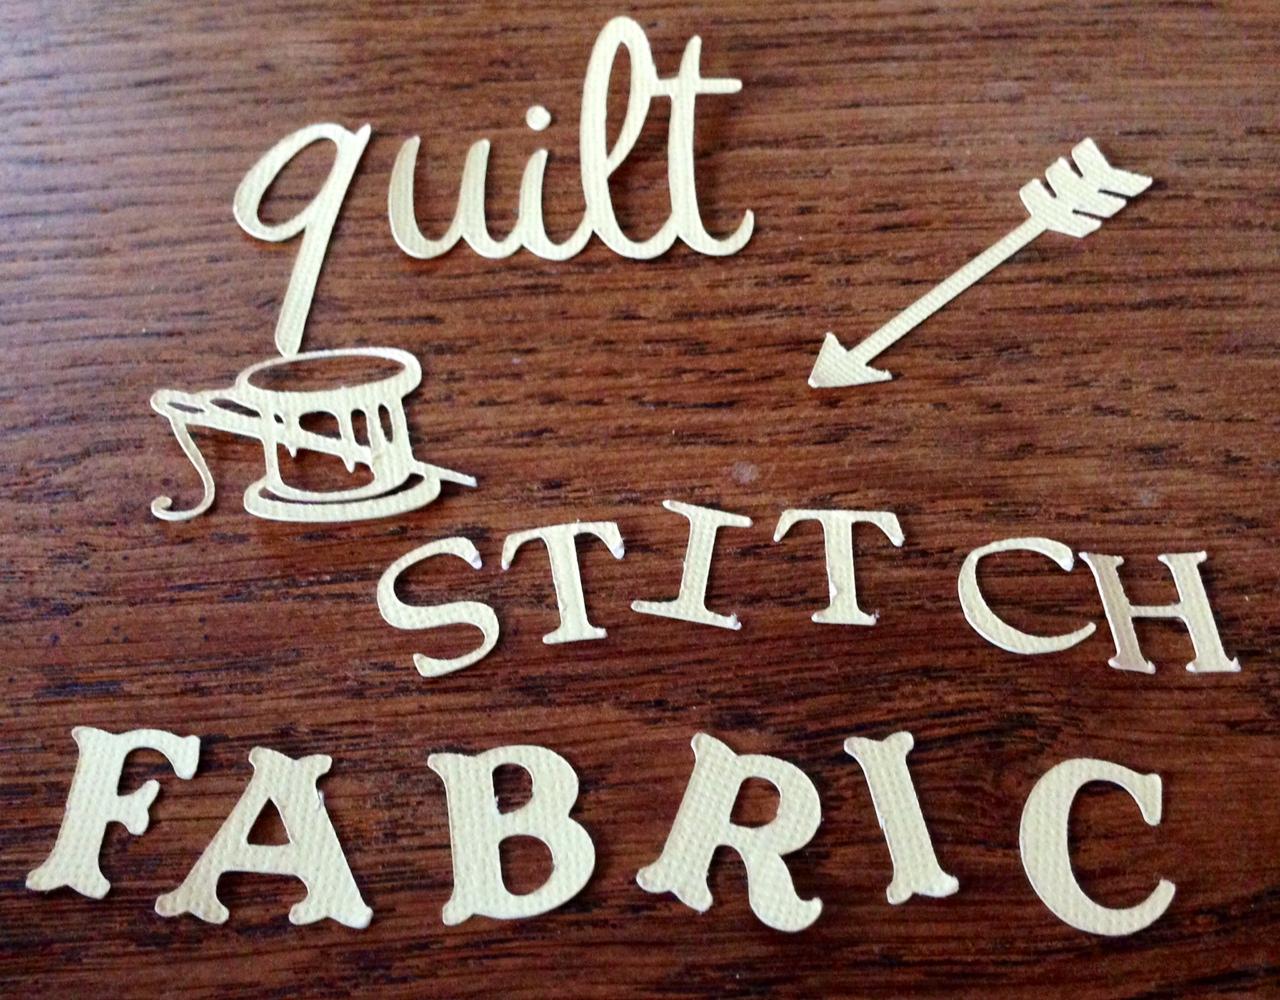 Cricut cut outs